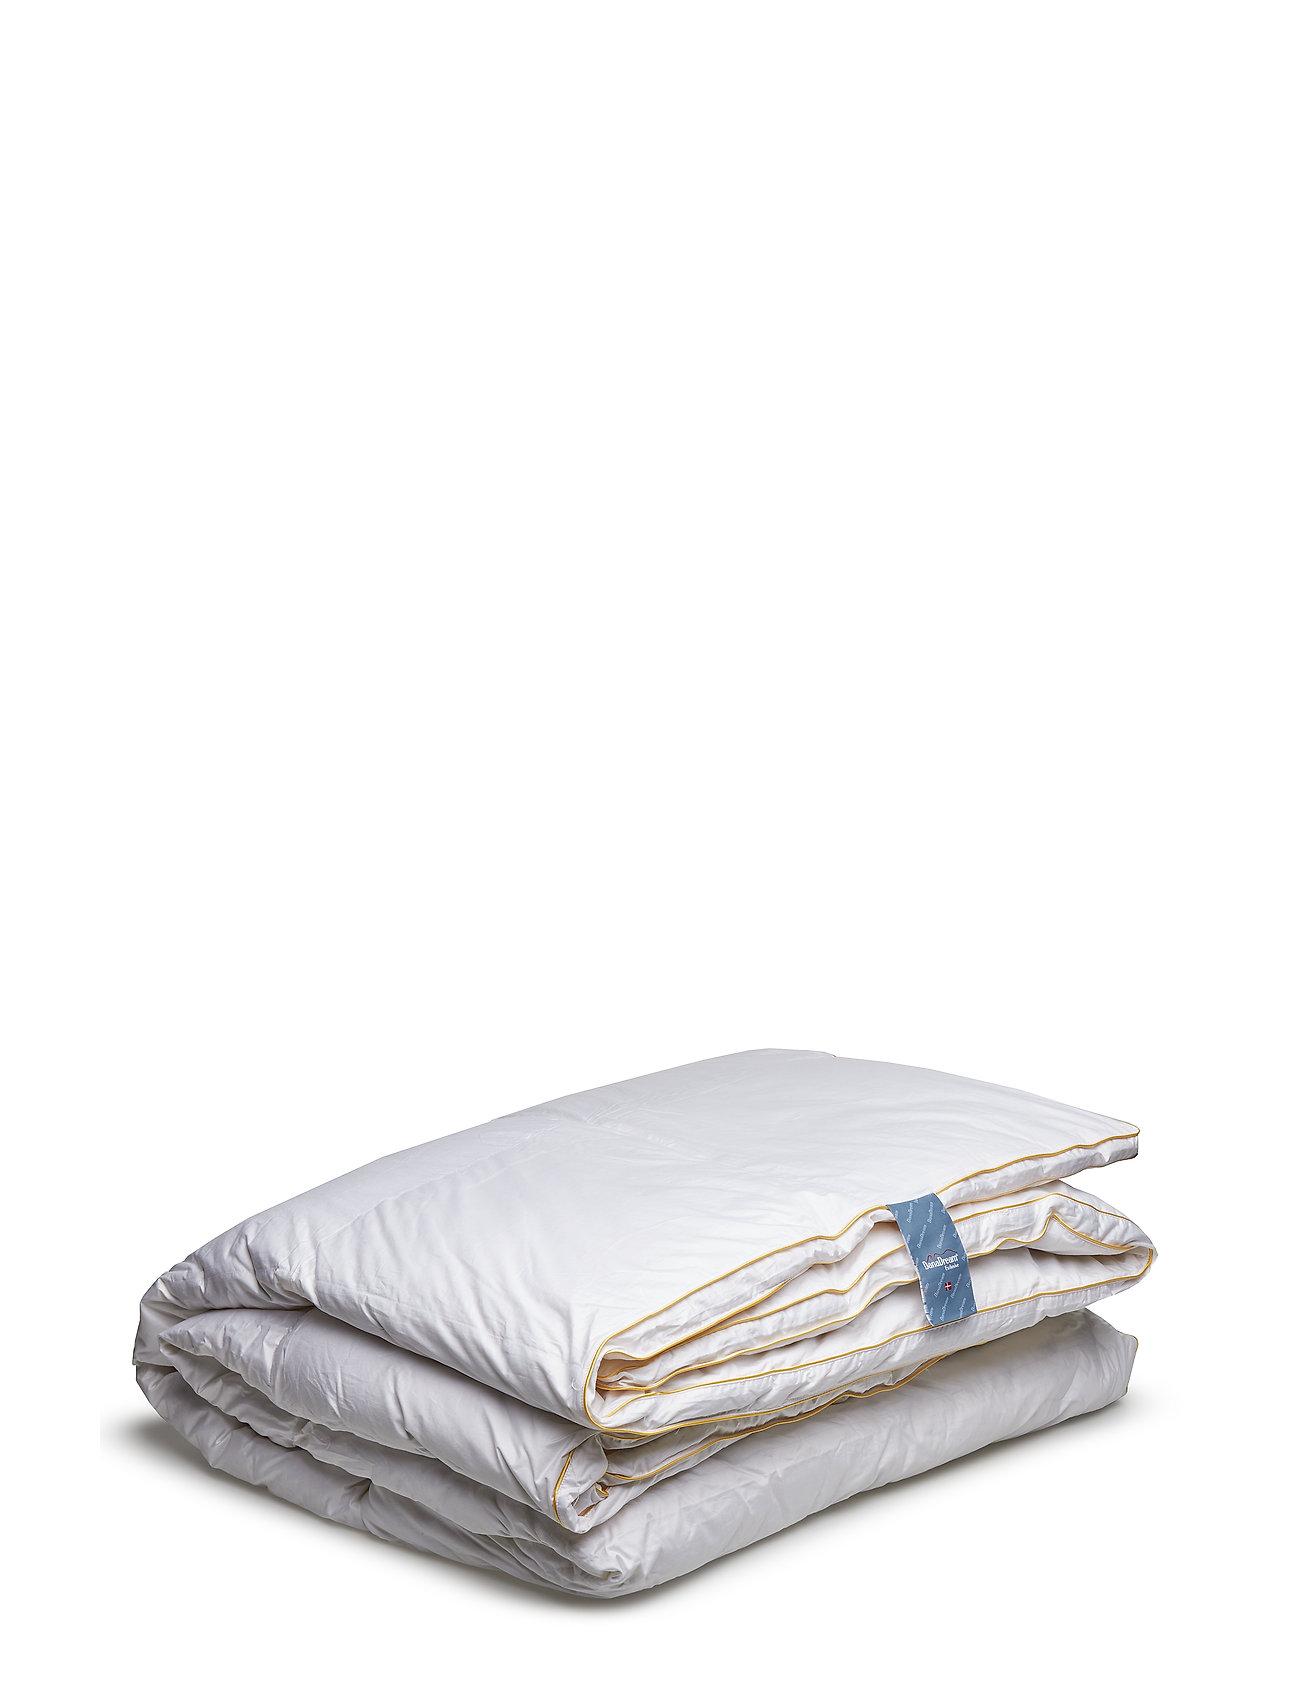 Quilts of Denmark Danadream Exclusive Varm Moskusdyne - WHITE